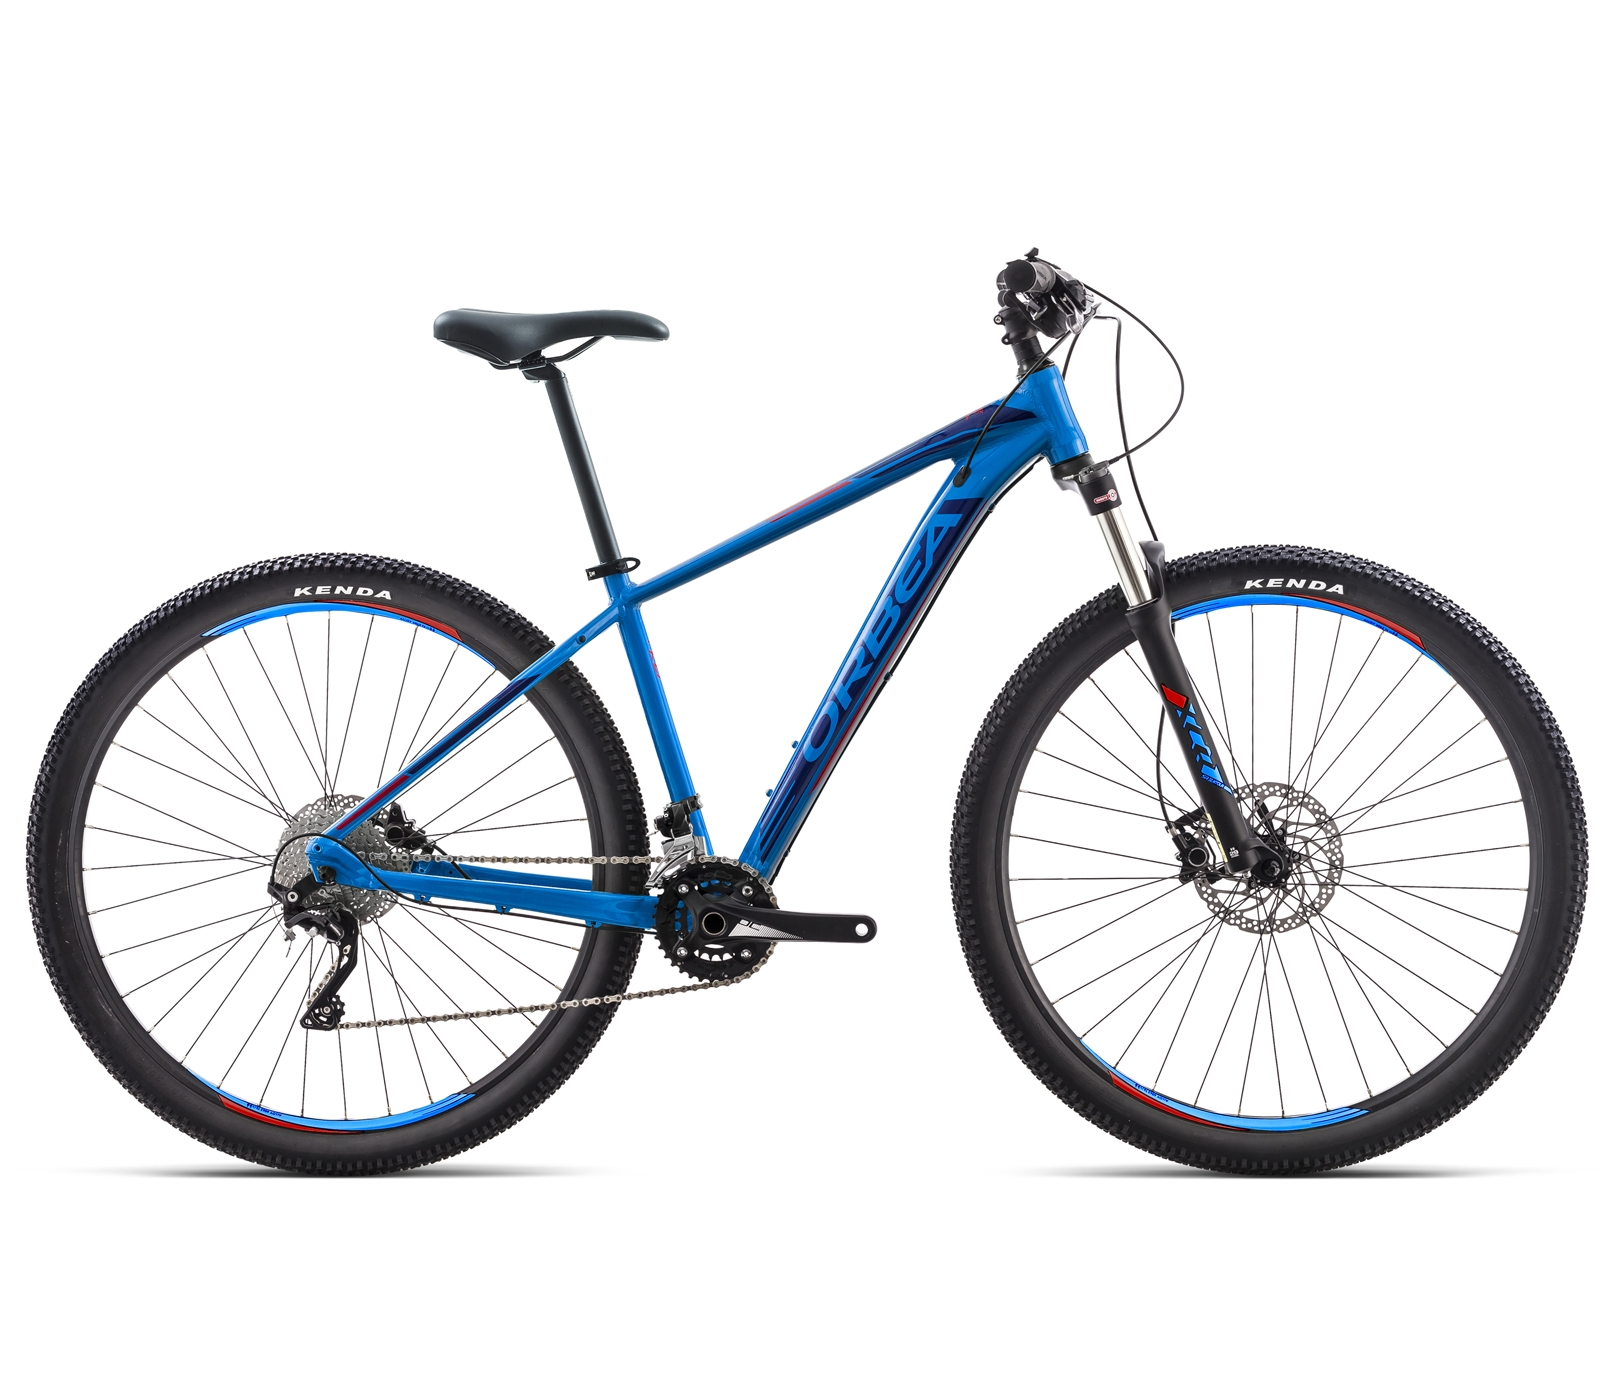 Orbea MX 20 27.5in / 29in hardtail mountain bike